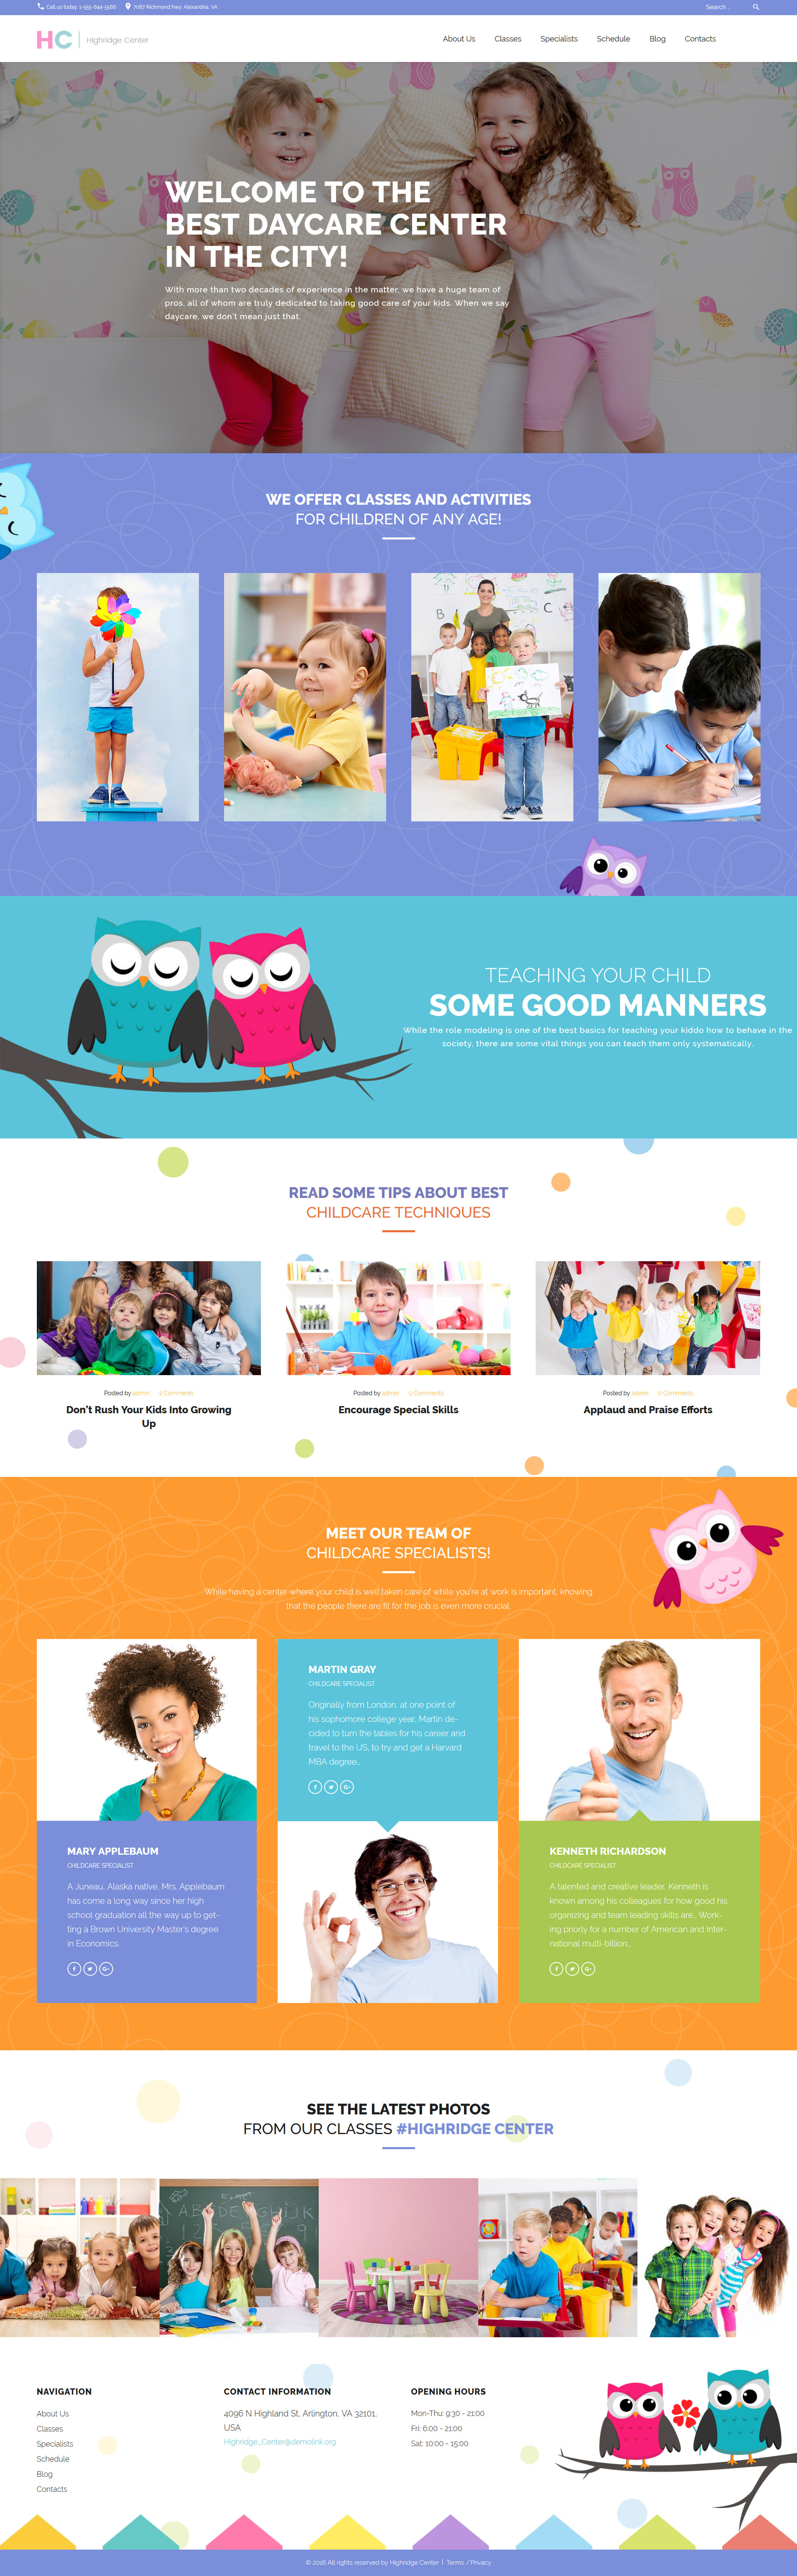 Responsive Highridge Center - Kindergarten & Child Care WordPress Theme #62115